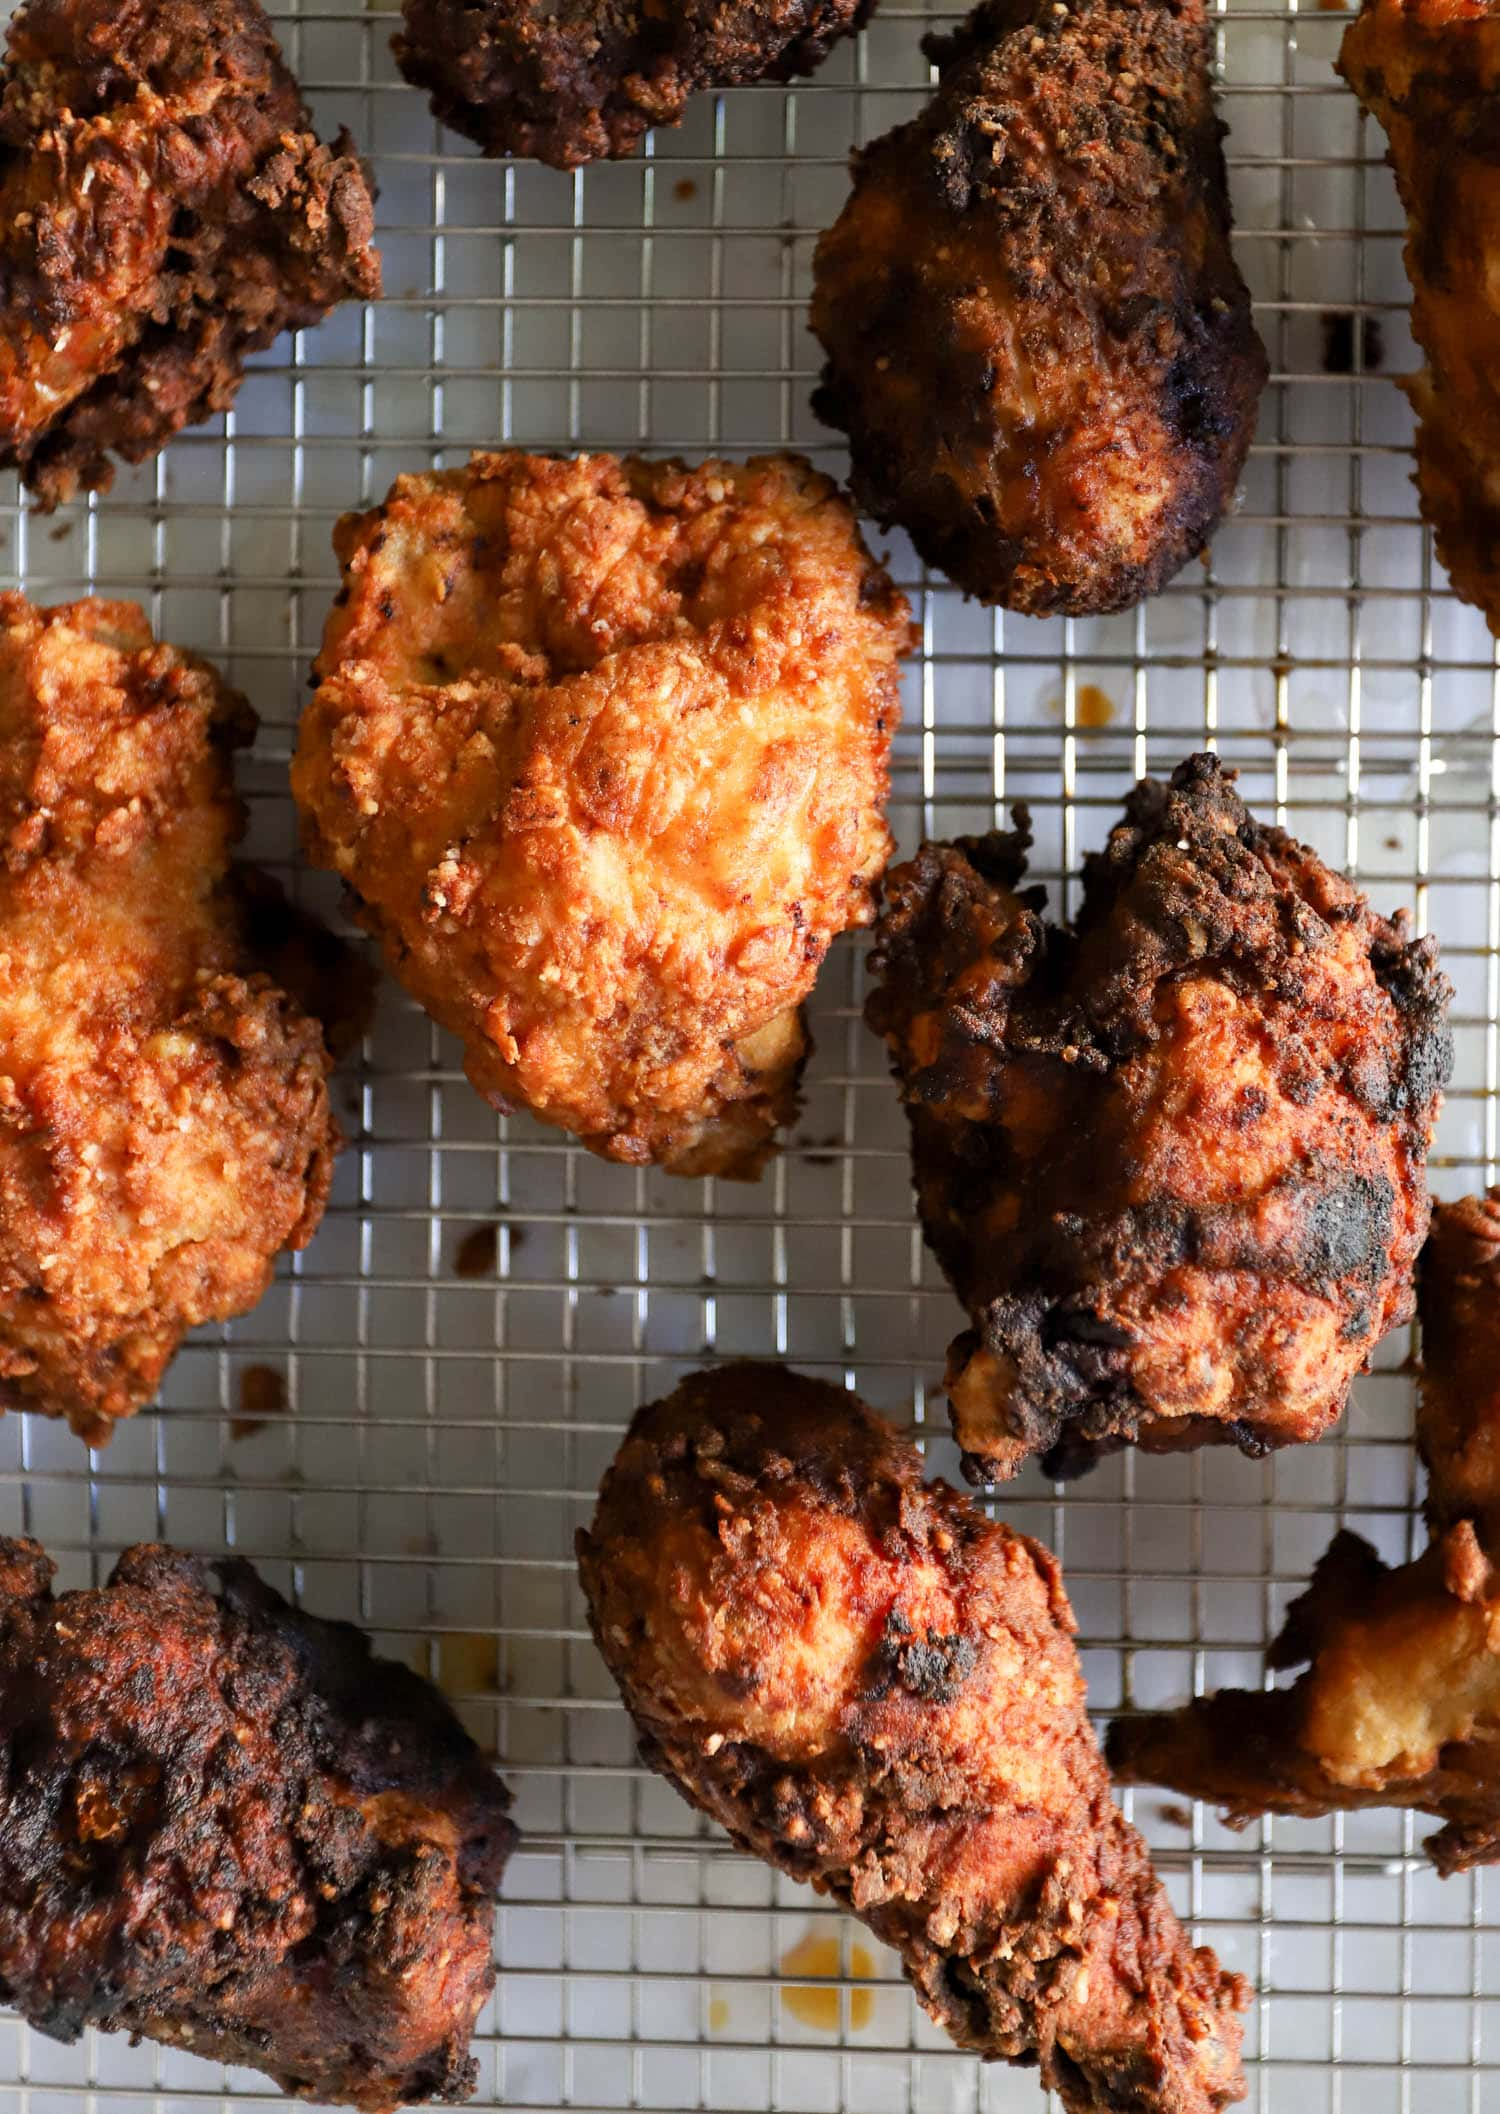 Buttermilk fried chicken on a wire rack